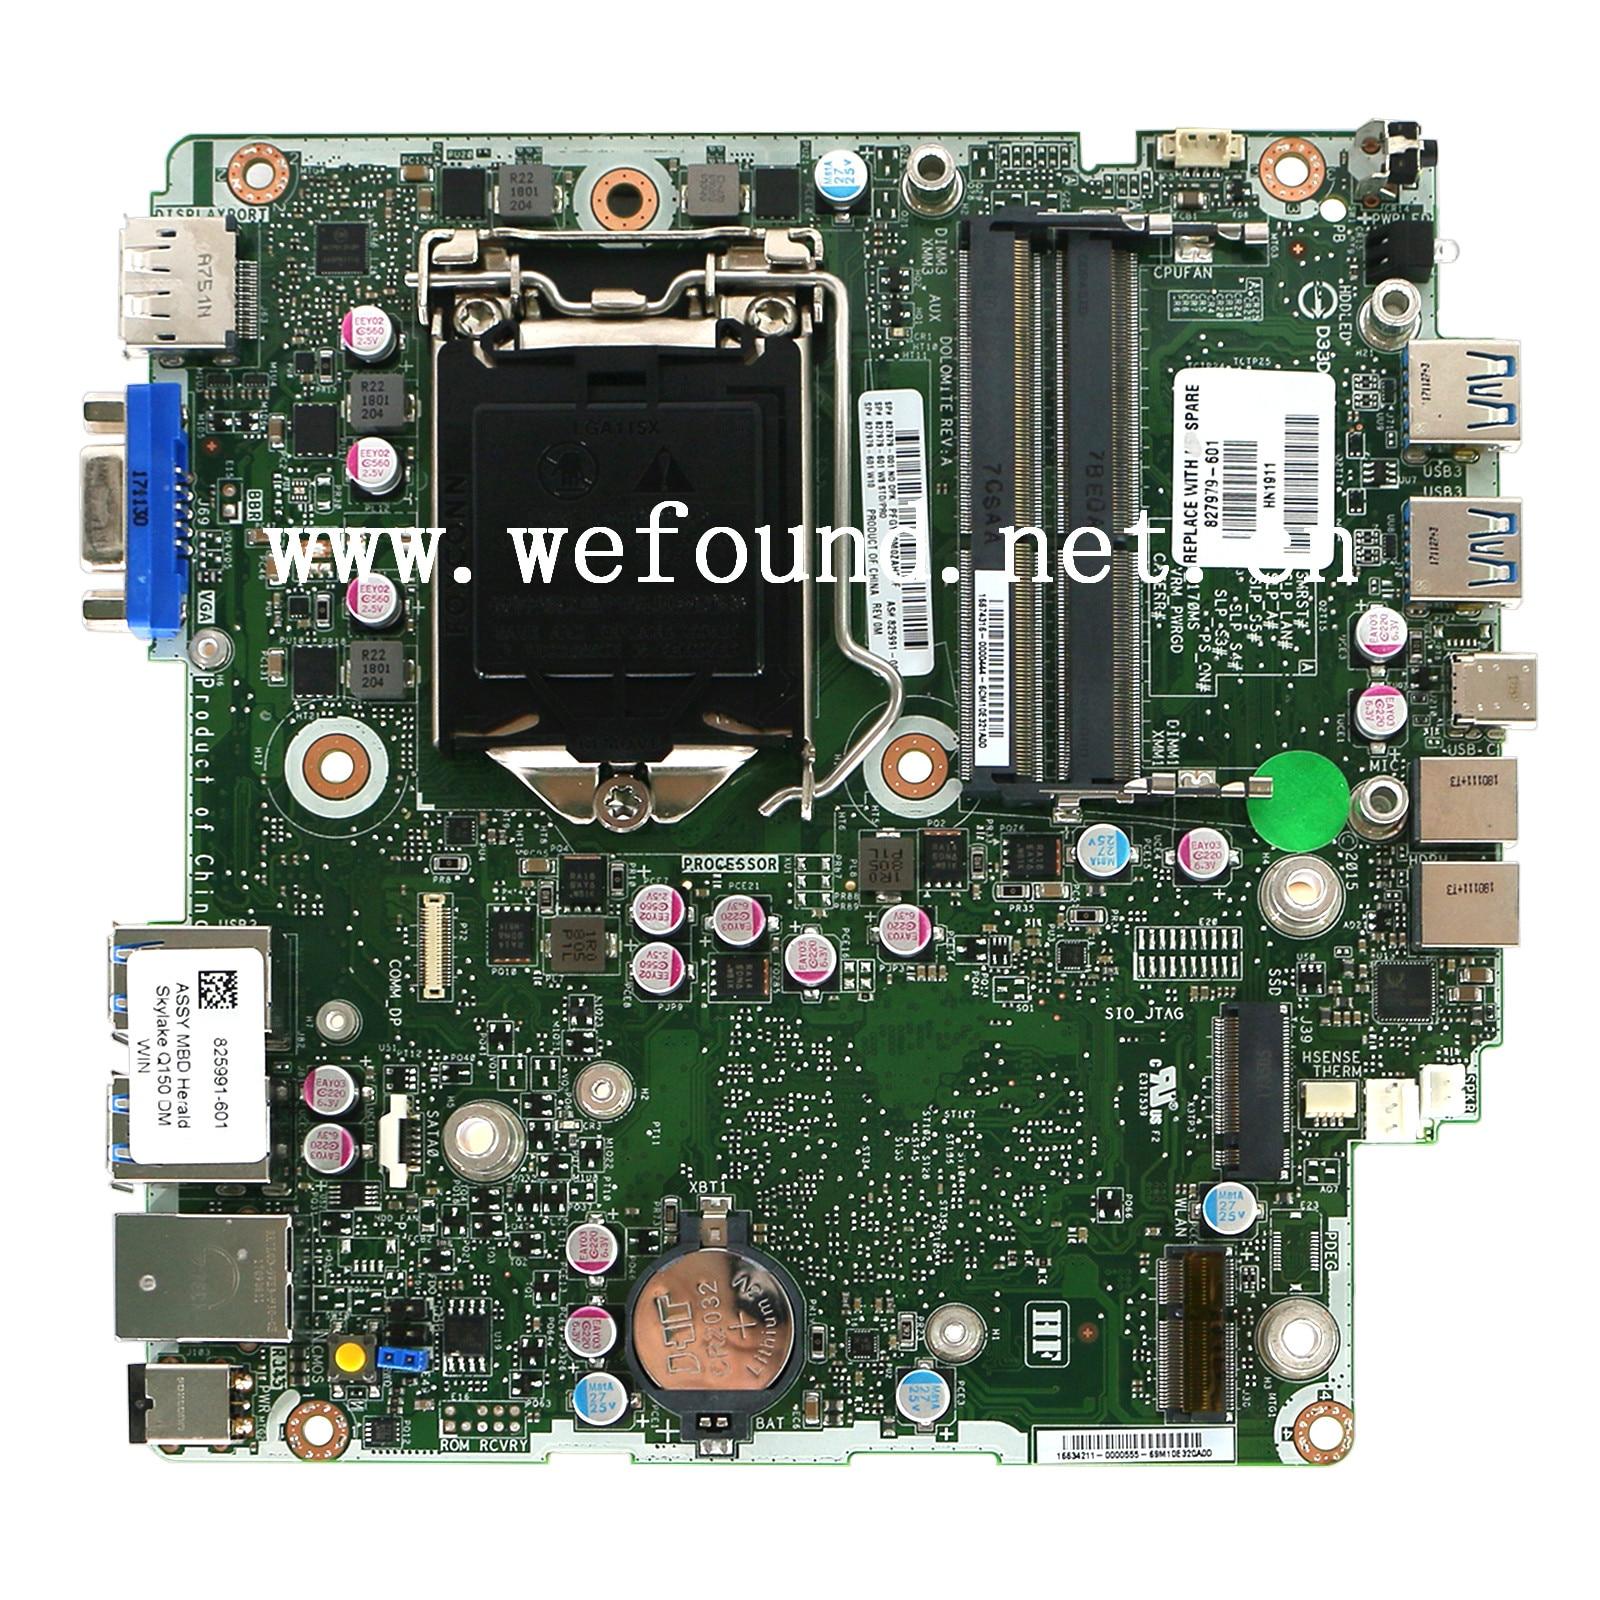 100% Working Desktop Motherboard For 600 G2 DM 827979-001 825991-001 System Board Fully Tested